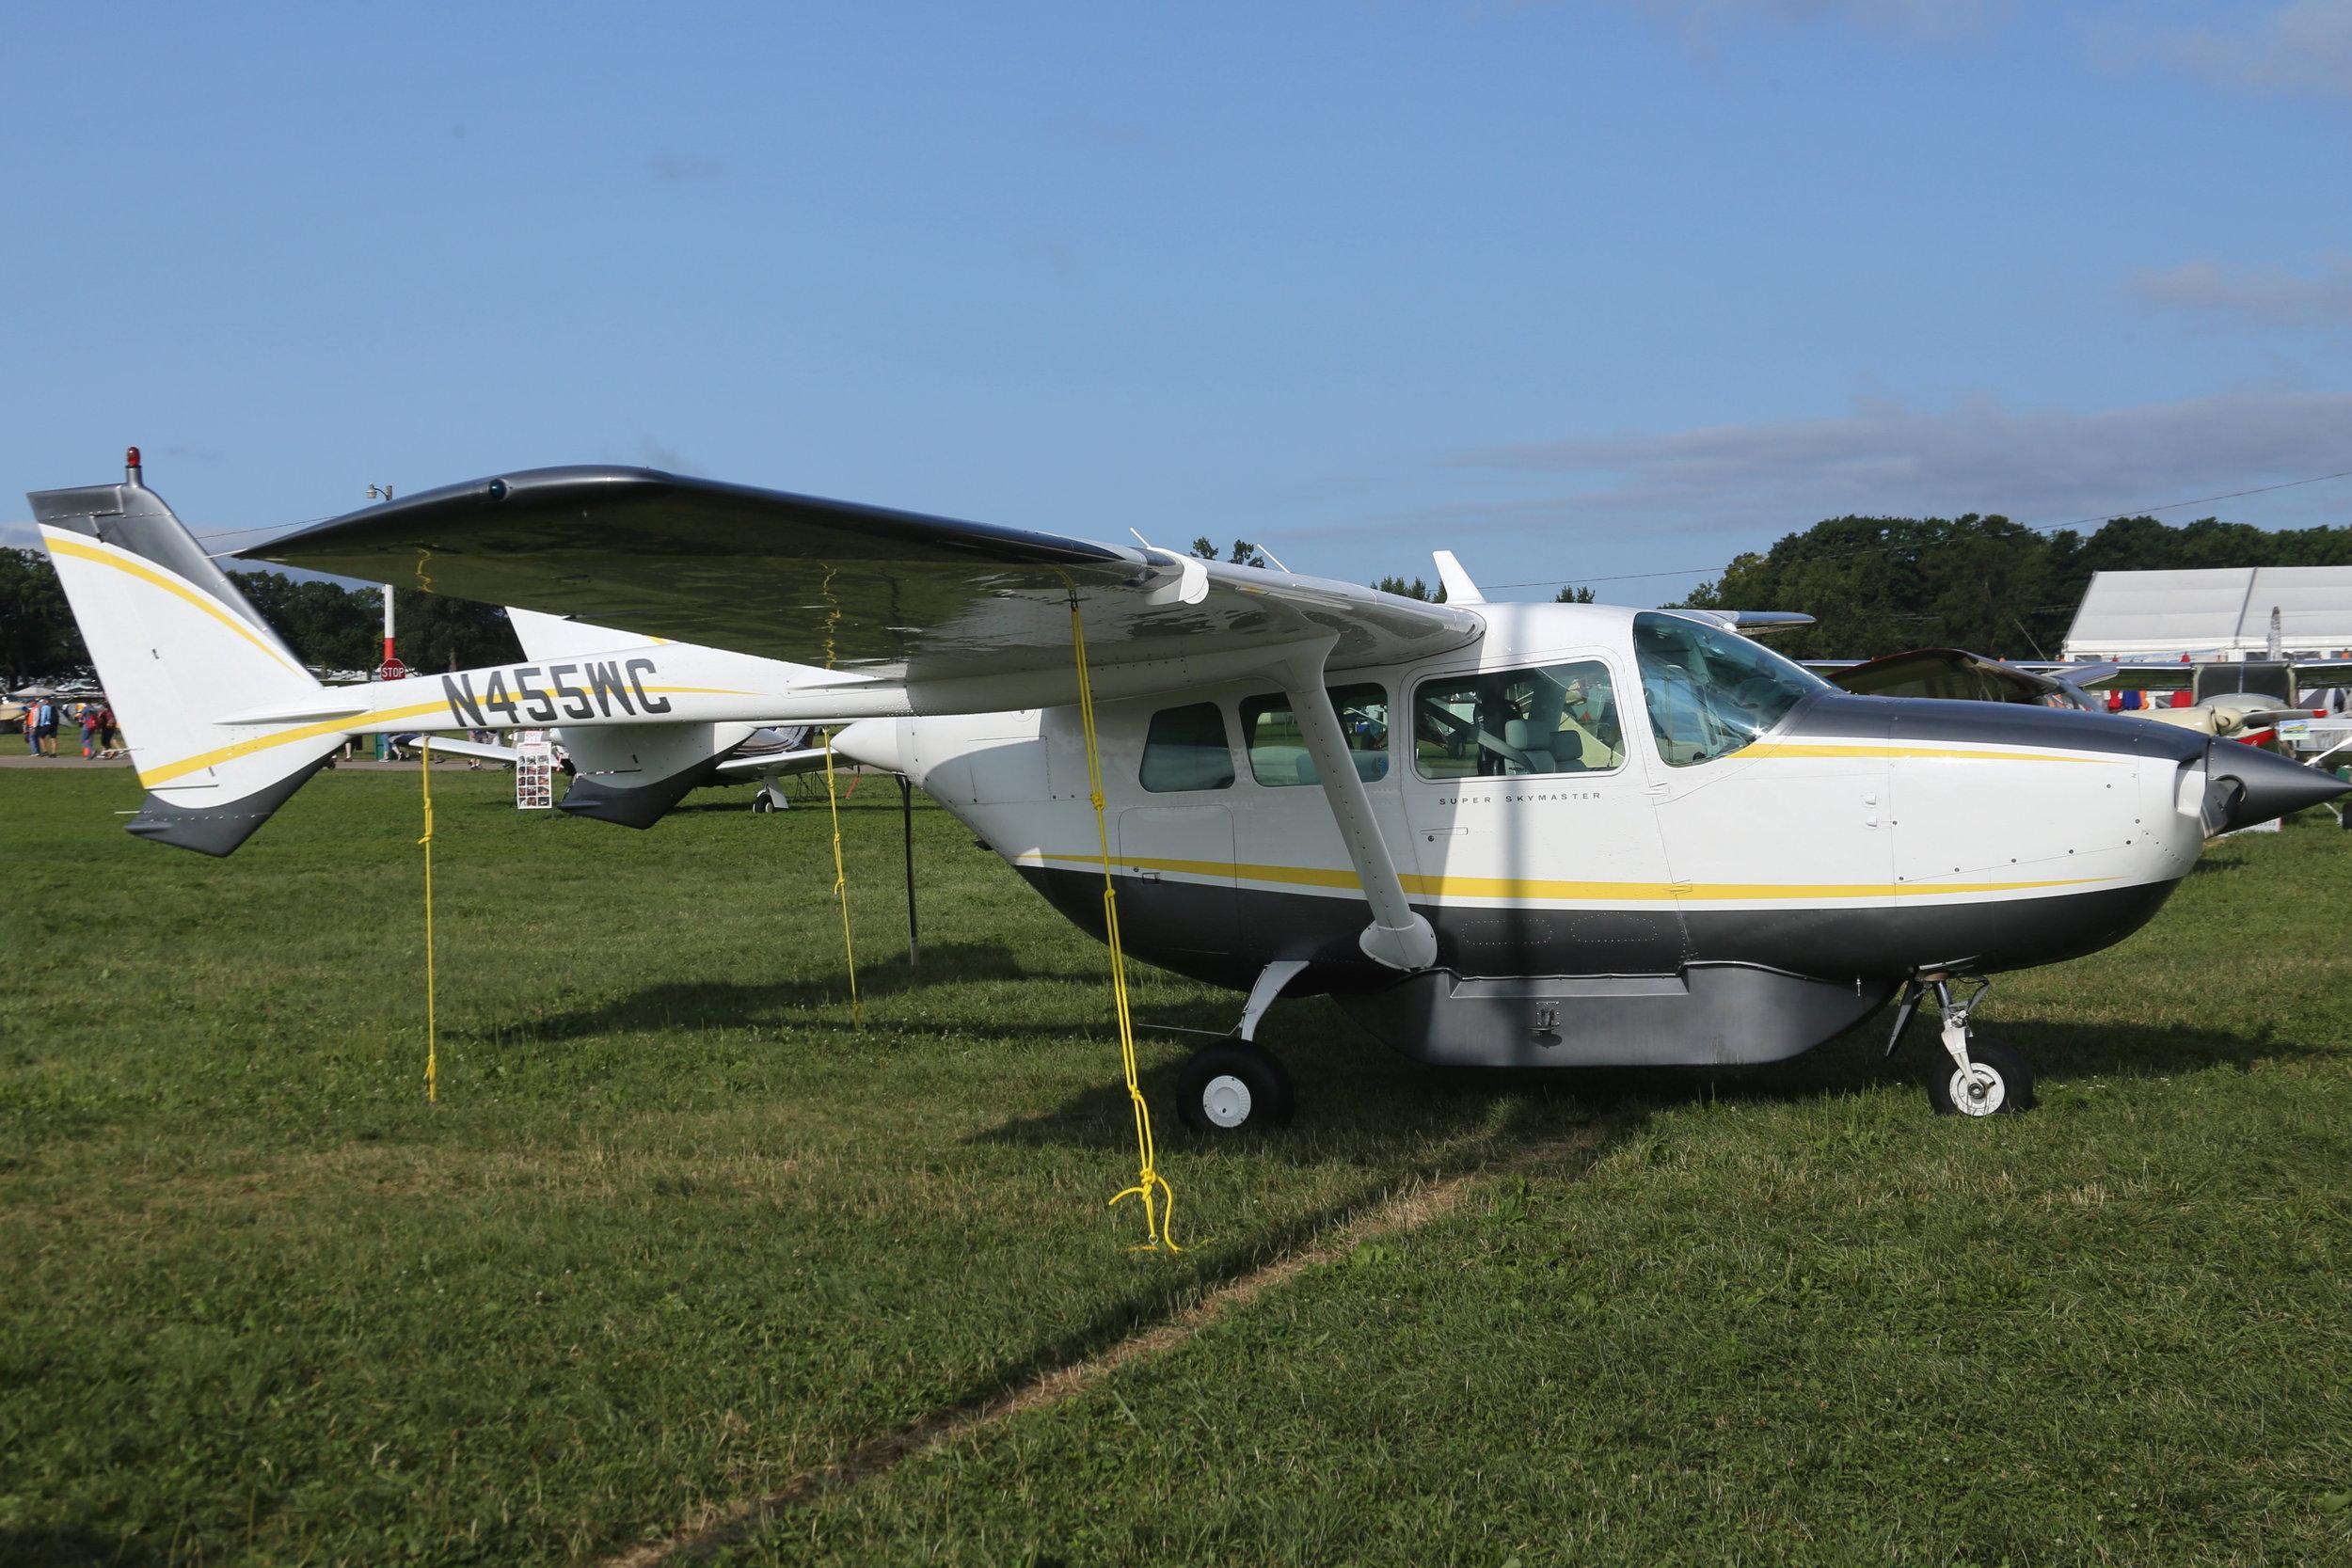 N455WC Cessna 337D taken at Oshkosh 27th July 2018 by John Wood